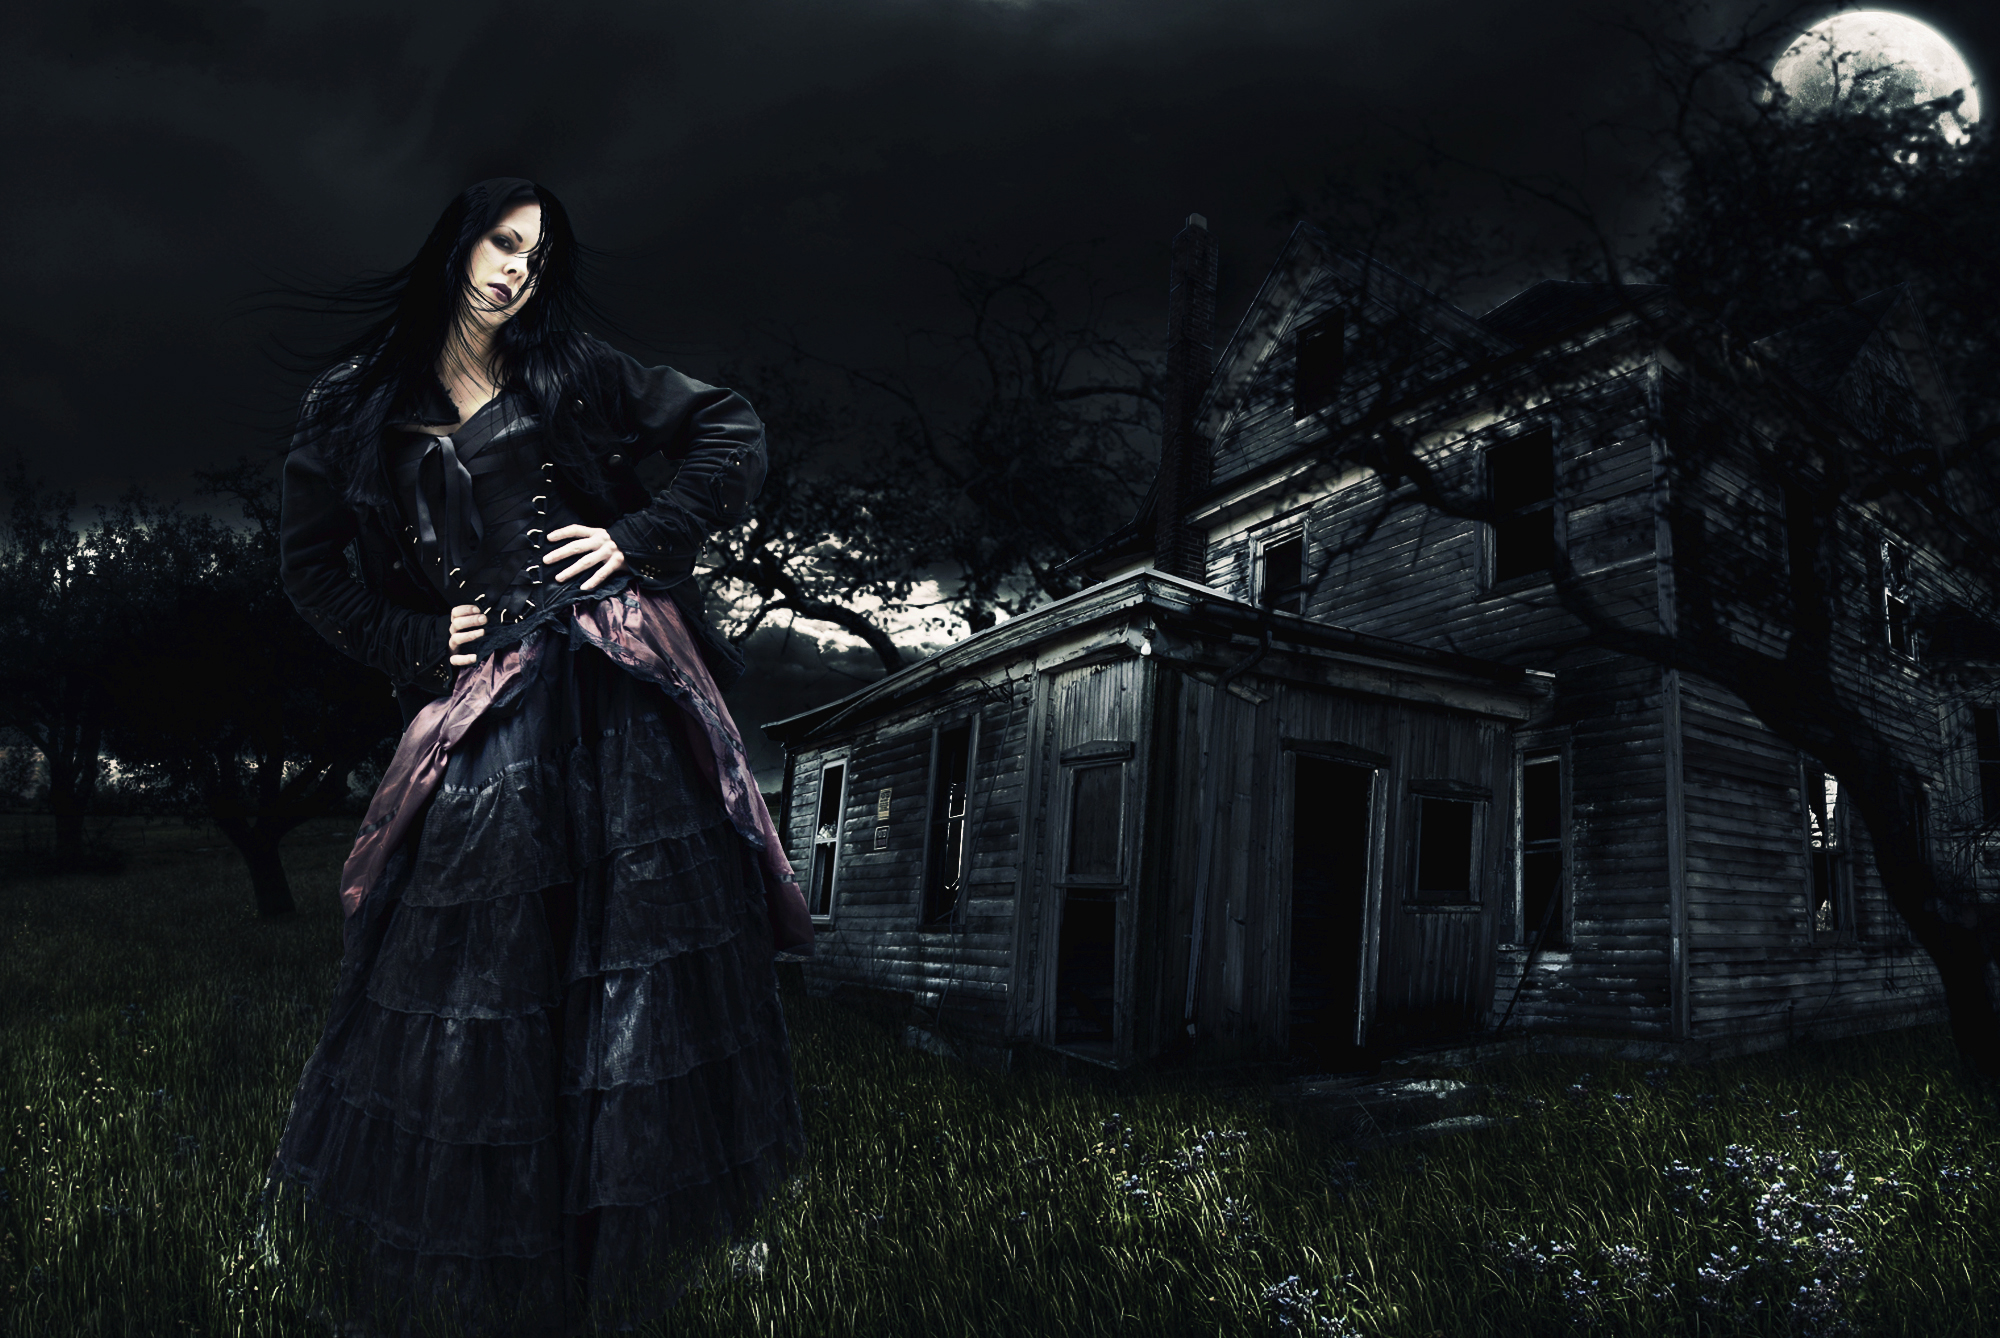 girl digital art photoshop manipulation fantasy surreal wallpaper 2000x1338